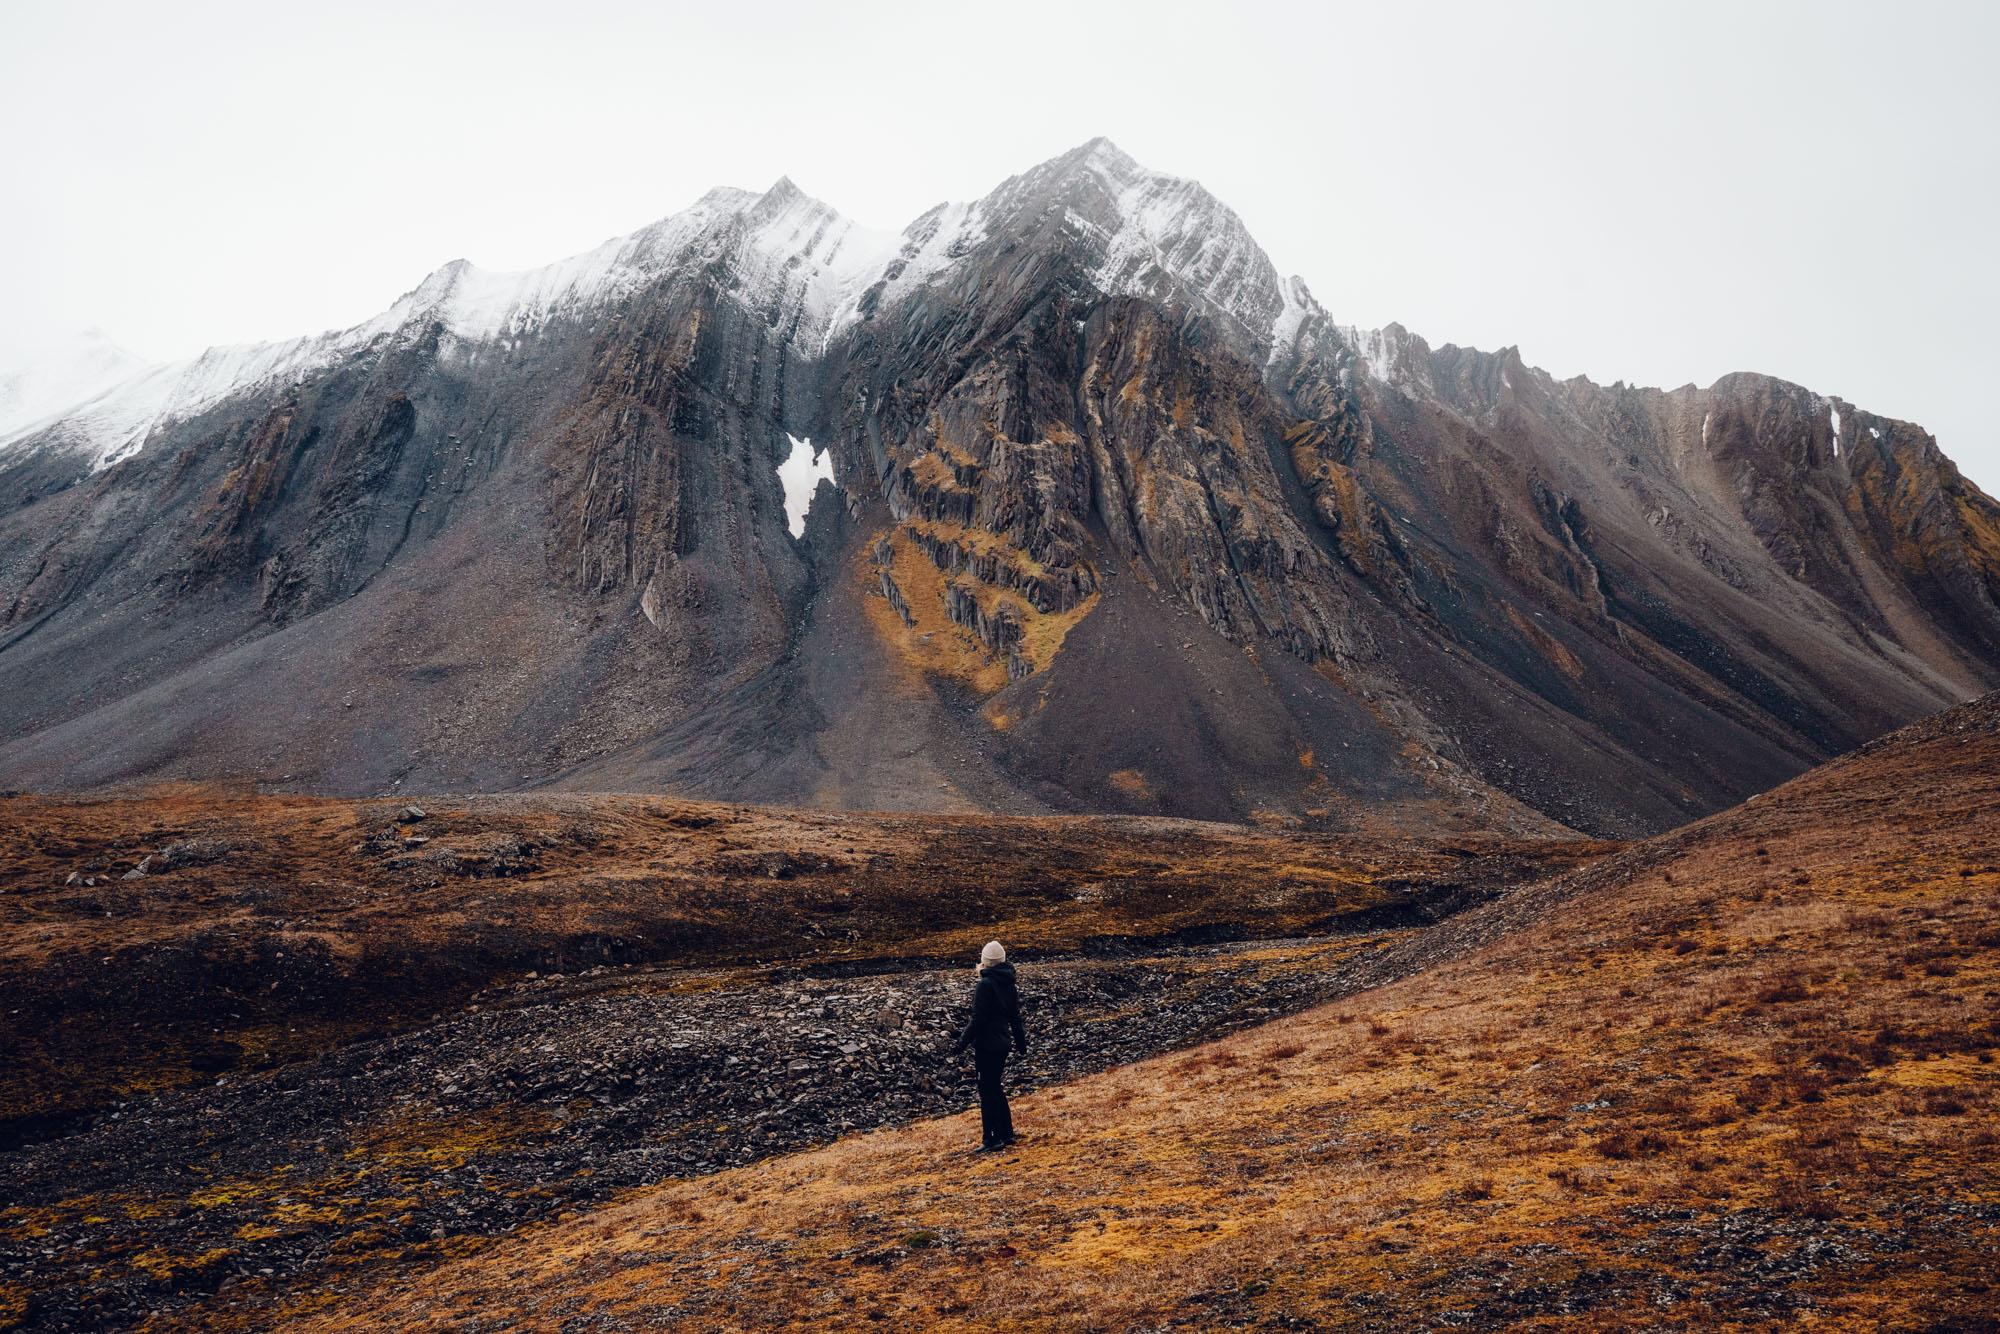 Mountains in Recherchefjorden in Svalbard, Norway